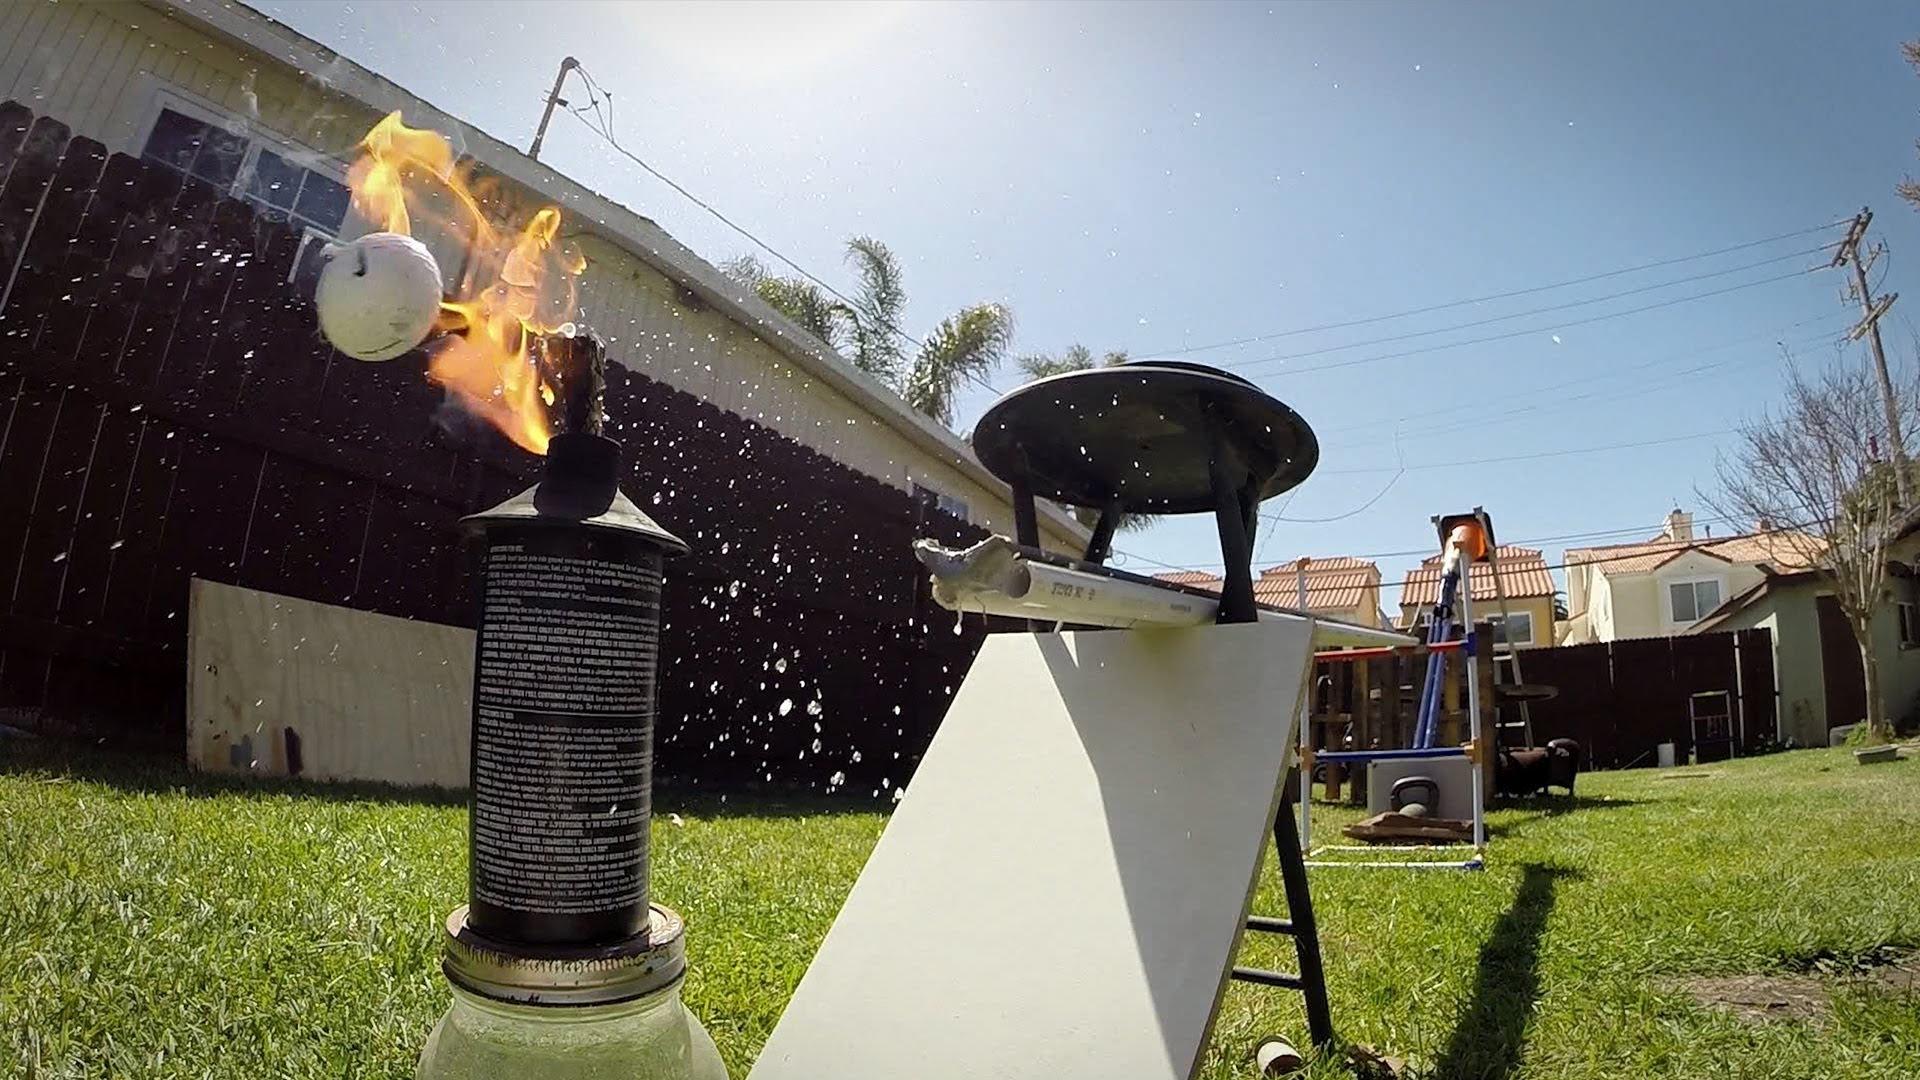 GoPro Video of a Backyard Golf Trick Shot Onto a Hot Dog-Dispensing Rube Goldberg-Style Machine